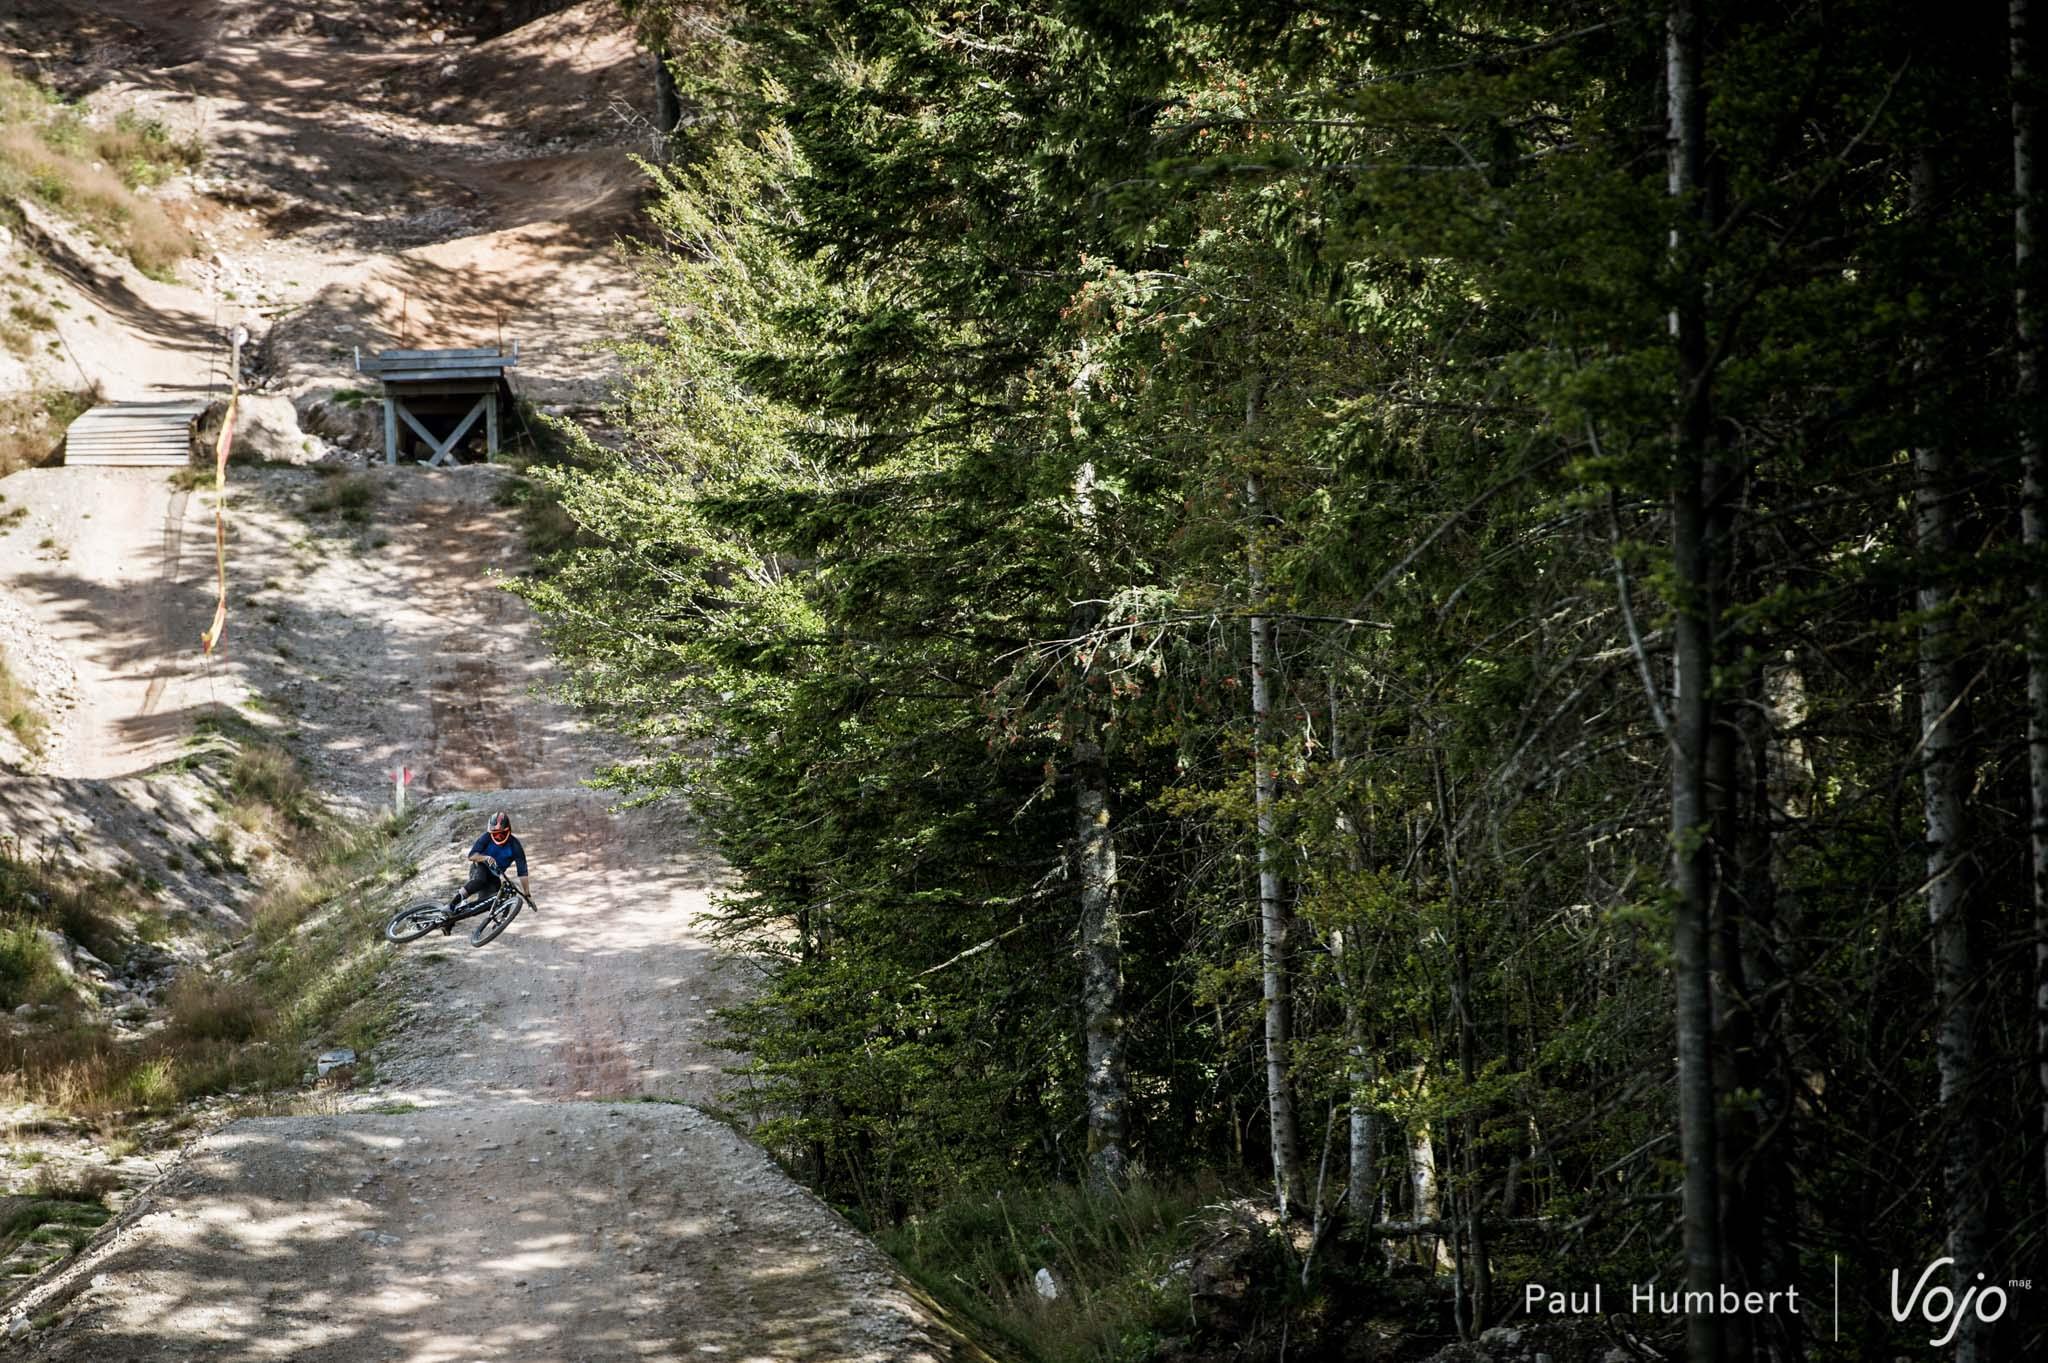 canyon-sender-2016-vojo-paul-humbert-28